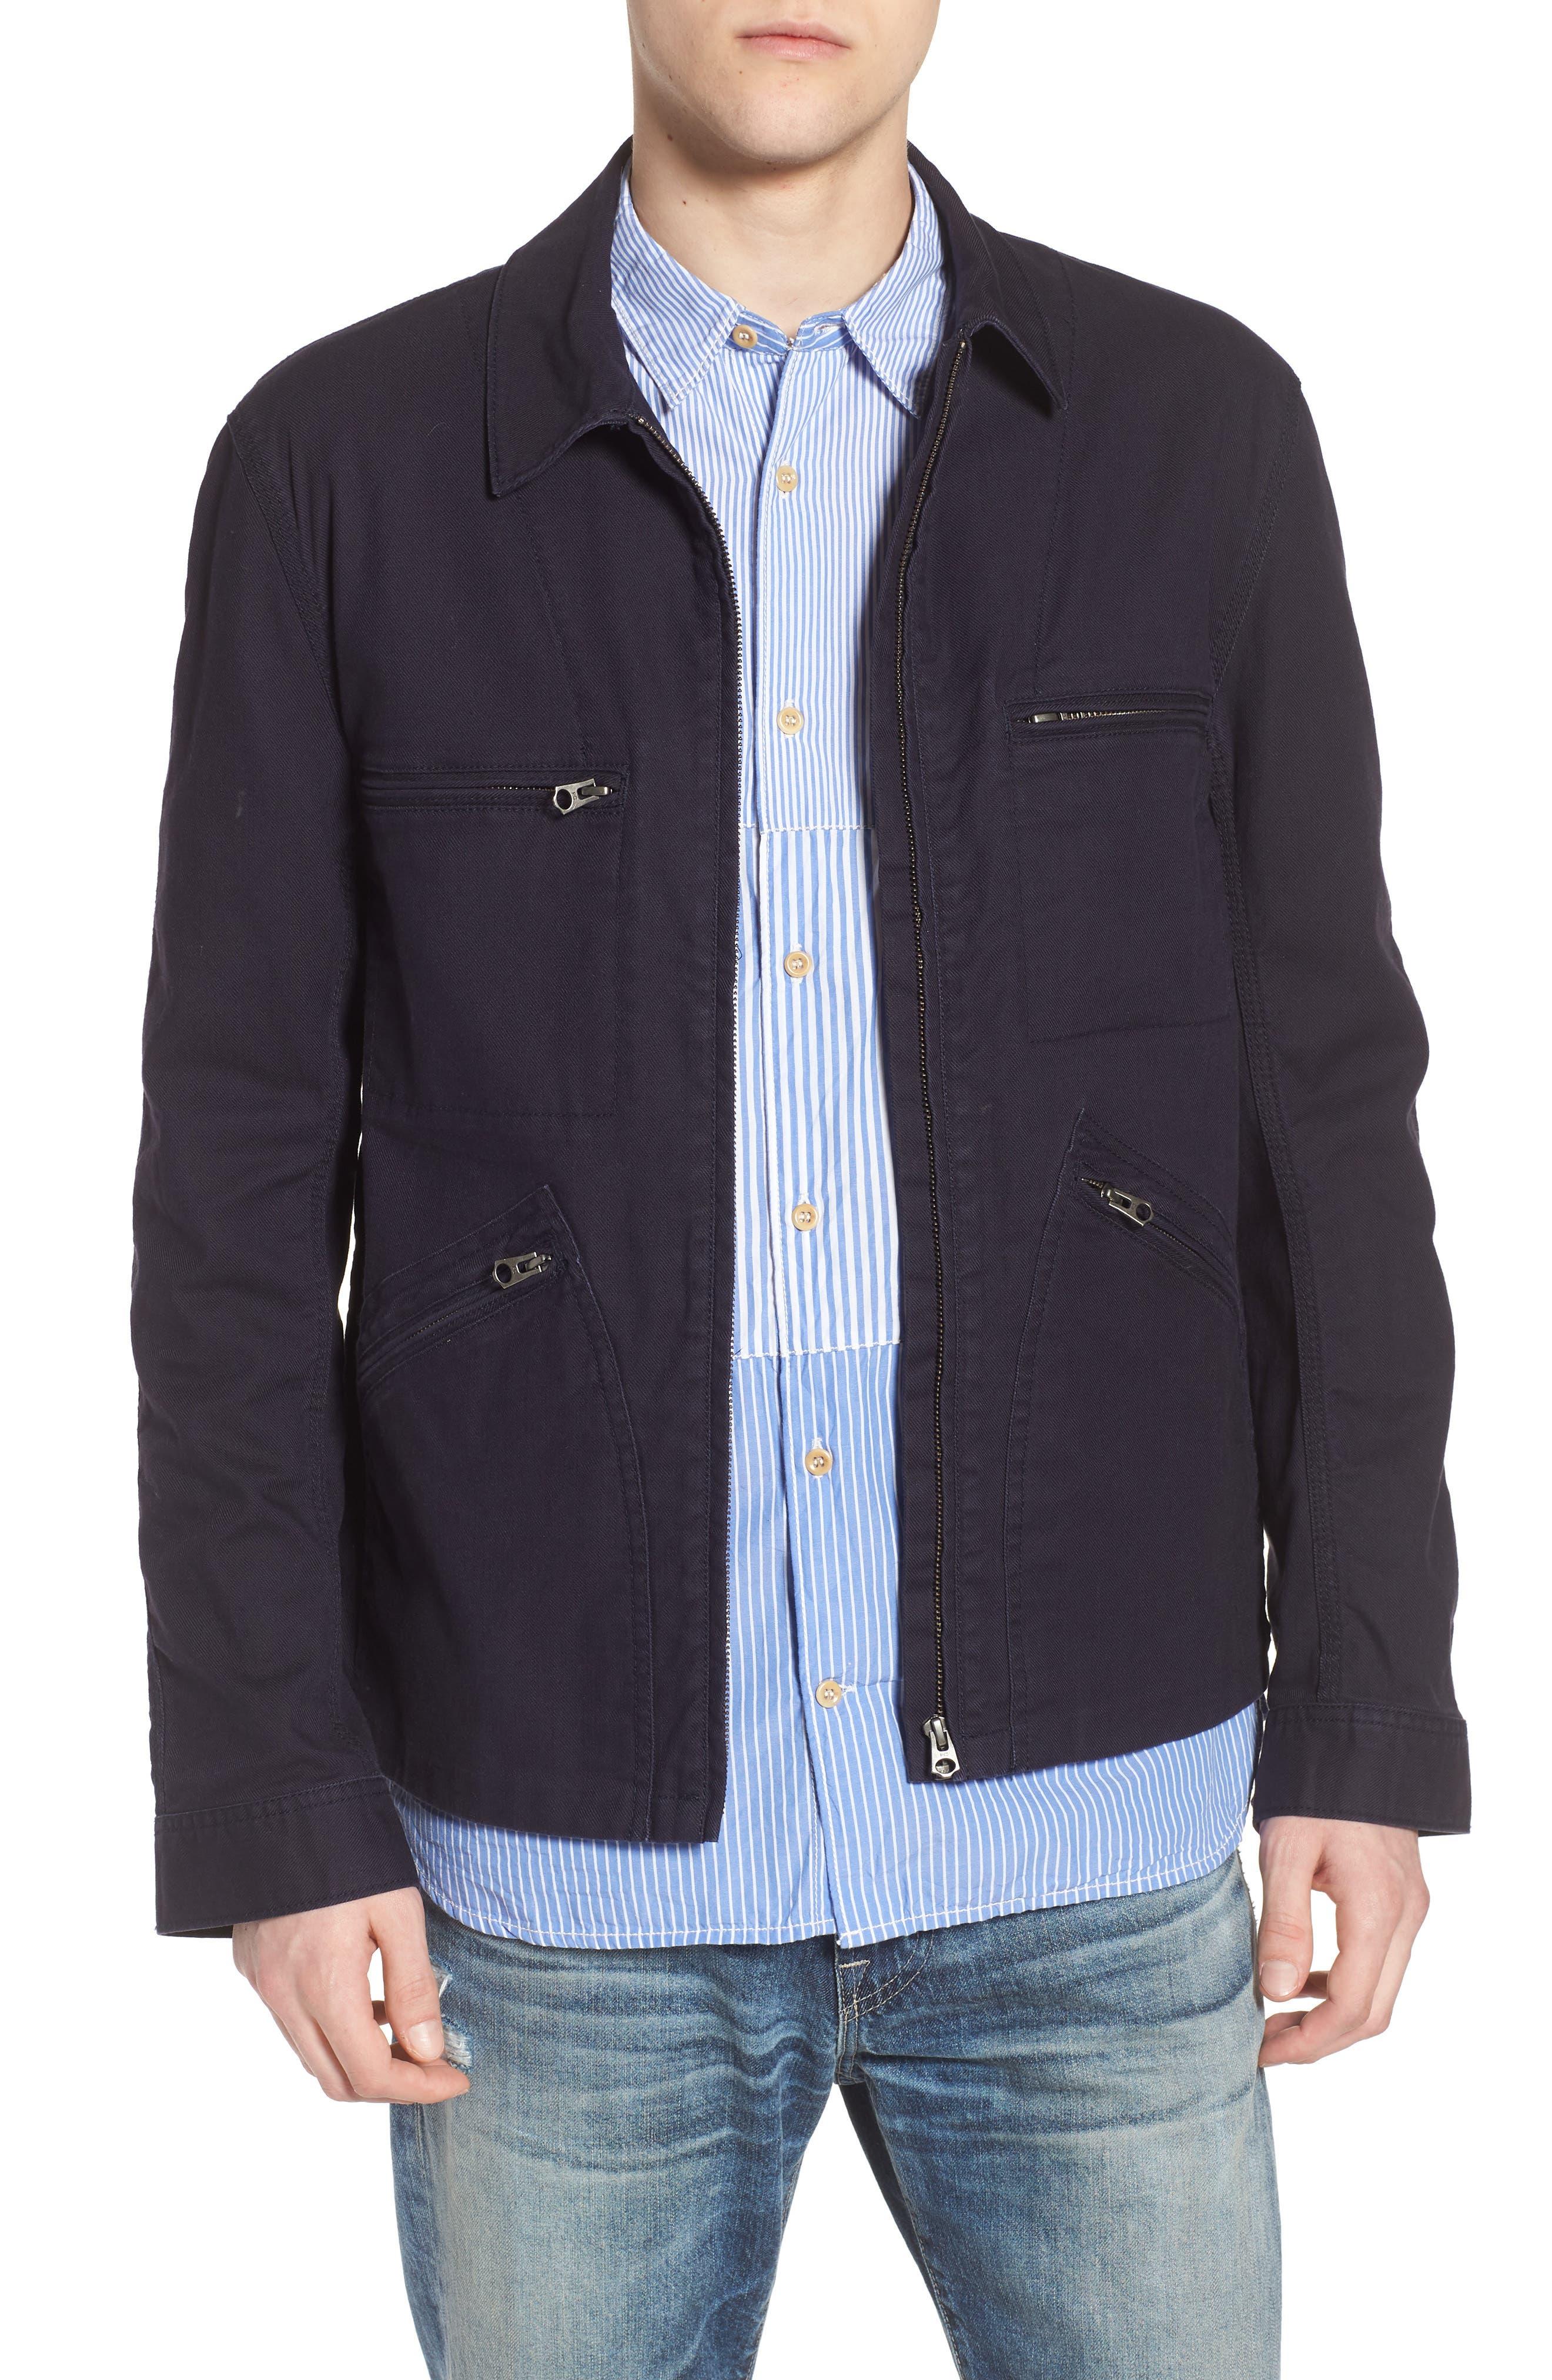 French Connection Slim Fit Slub Twill Cotton & Linen Jacket